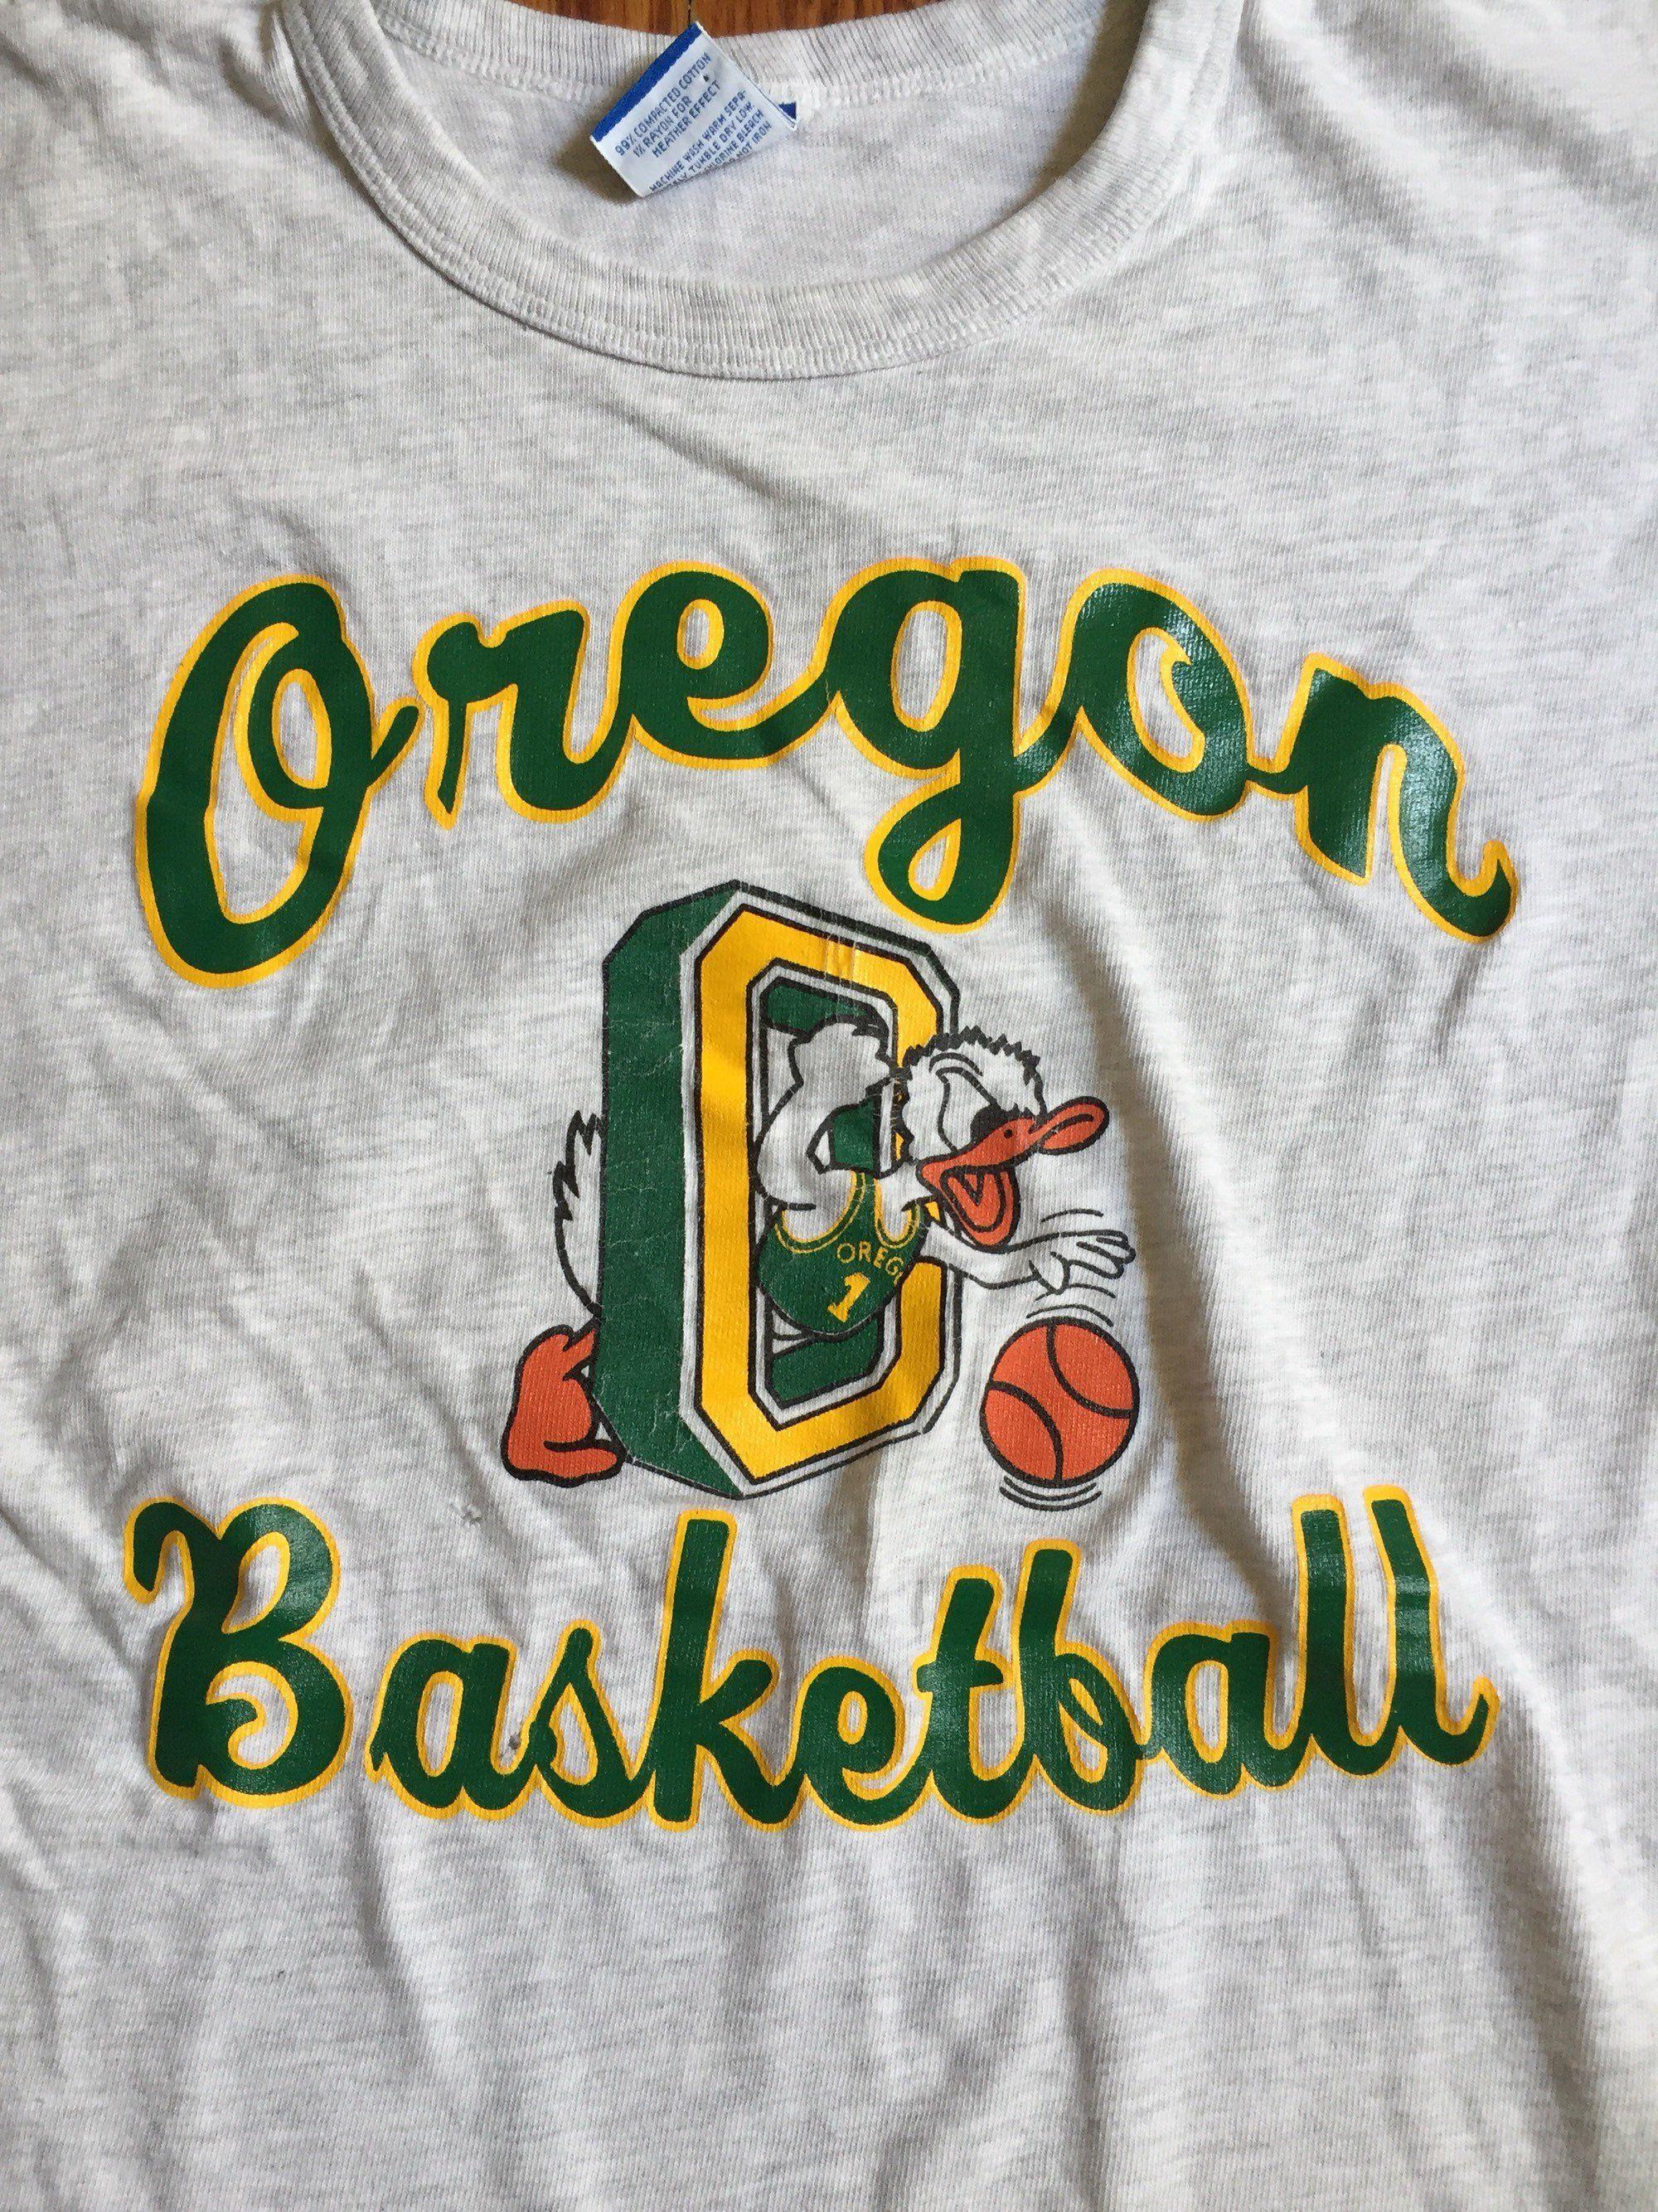 University Of Vermont Catamounts Mens T-Shirt Sz Large New